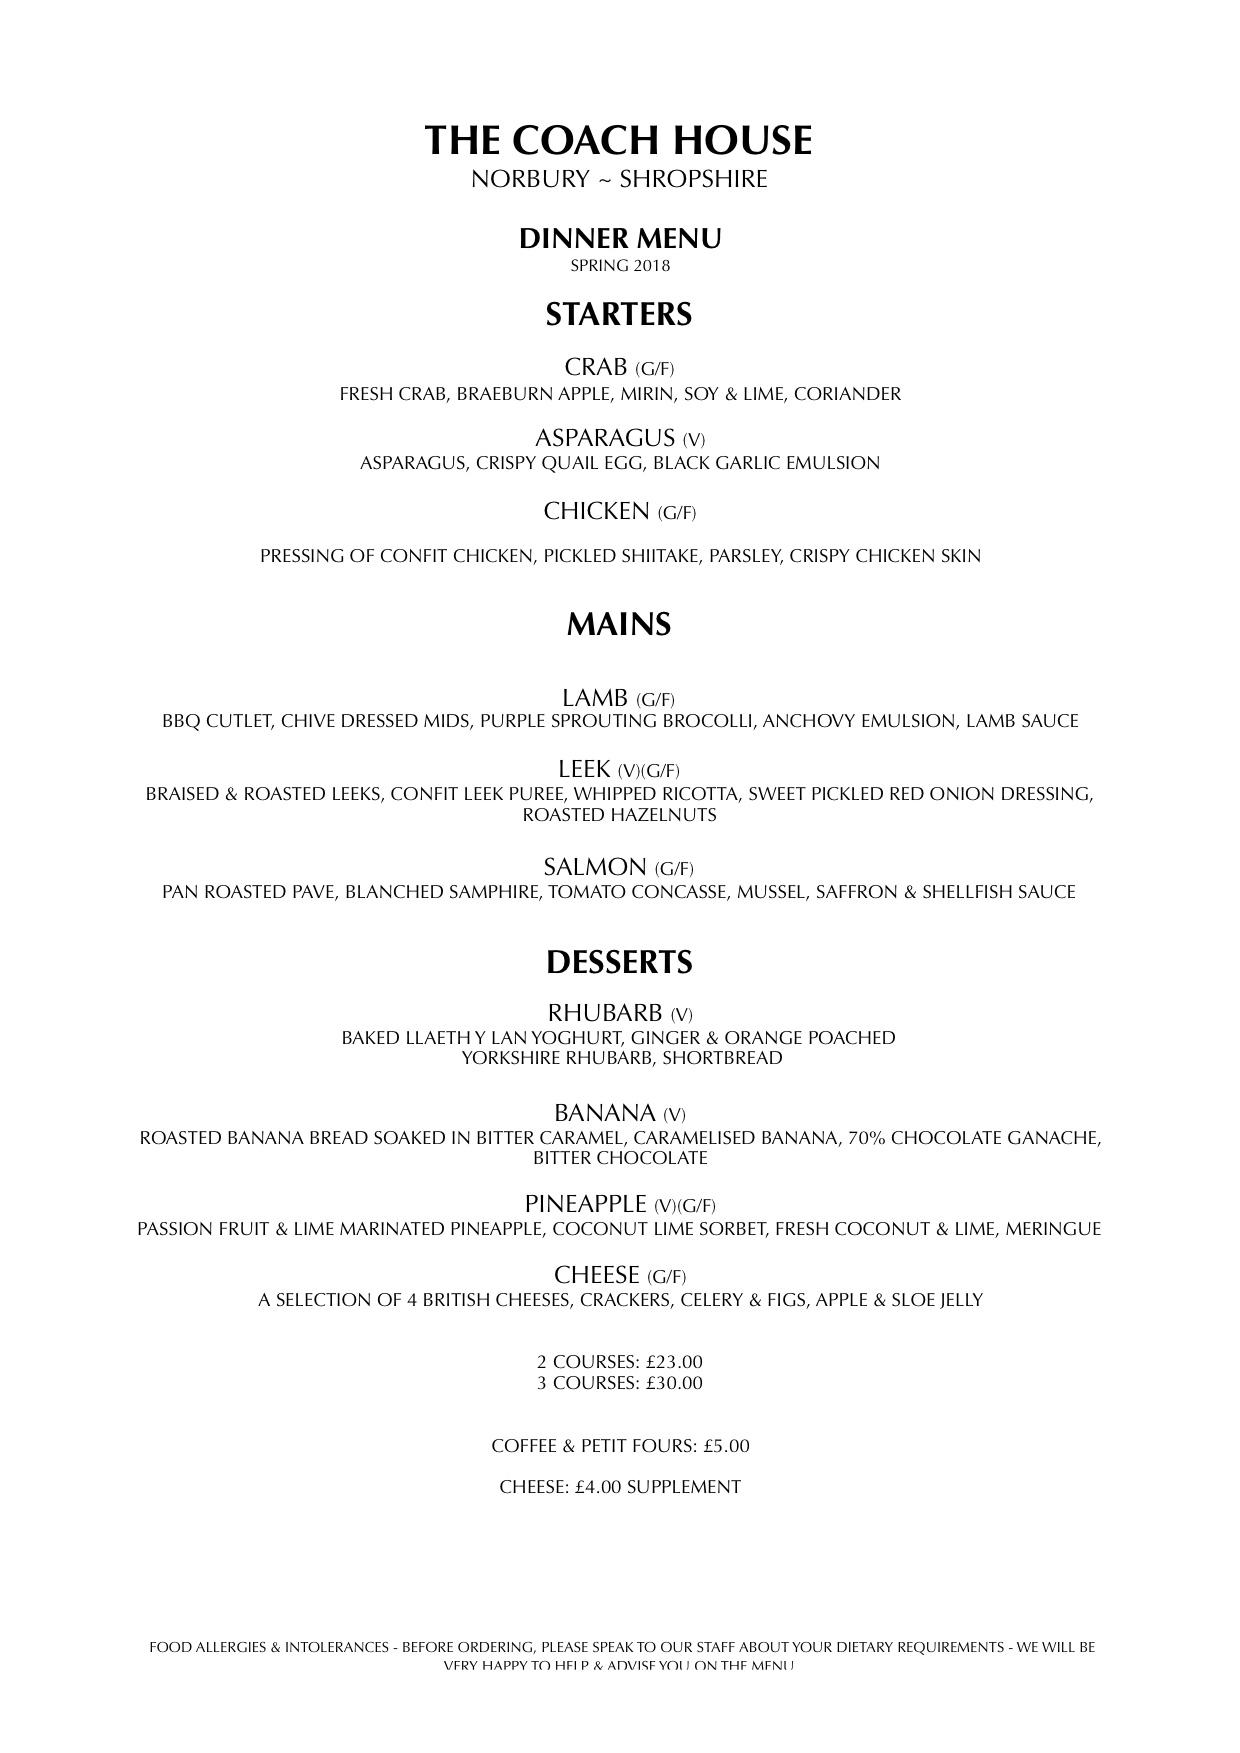 Spring Dinner Menu March 2018 PDF.jpg